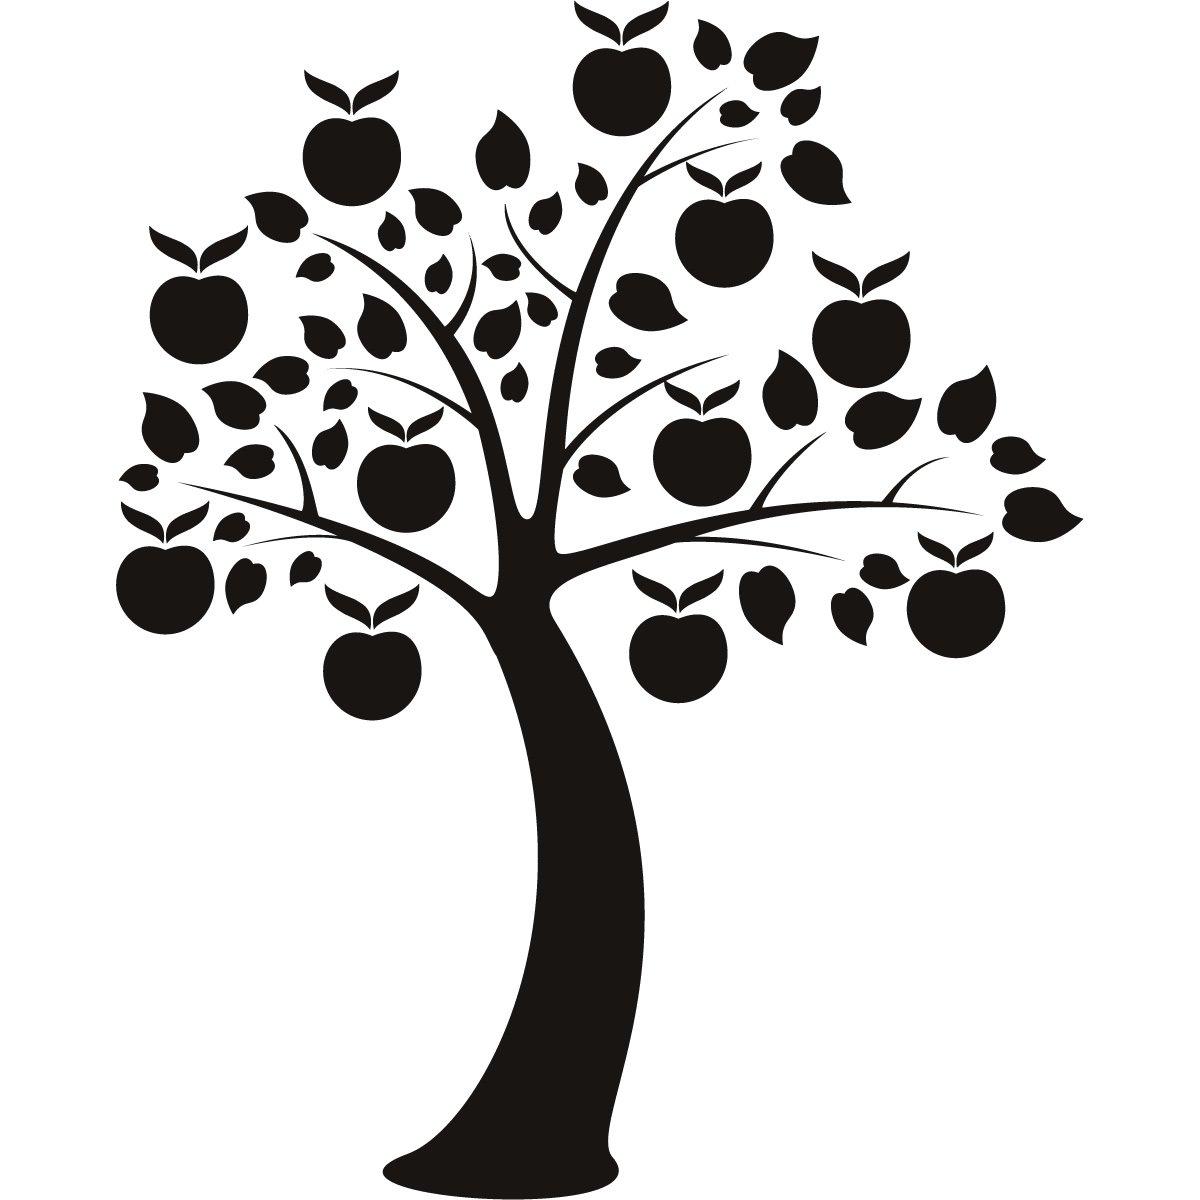 12 Apple Tree Icon Images